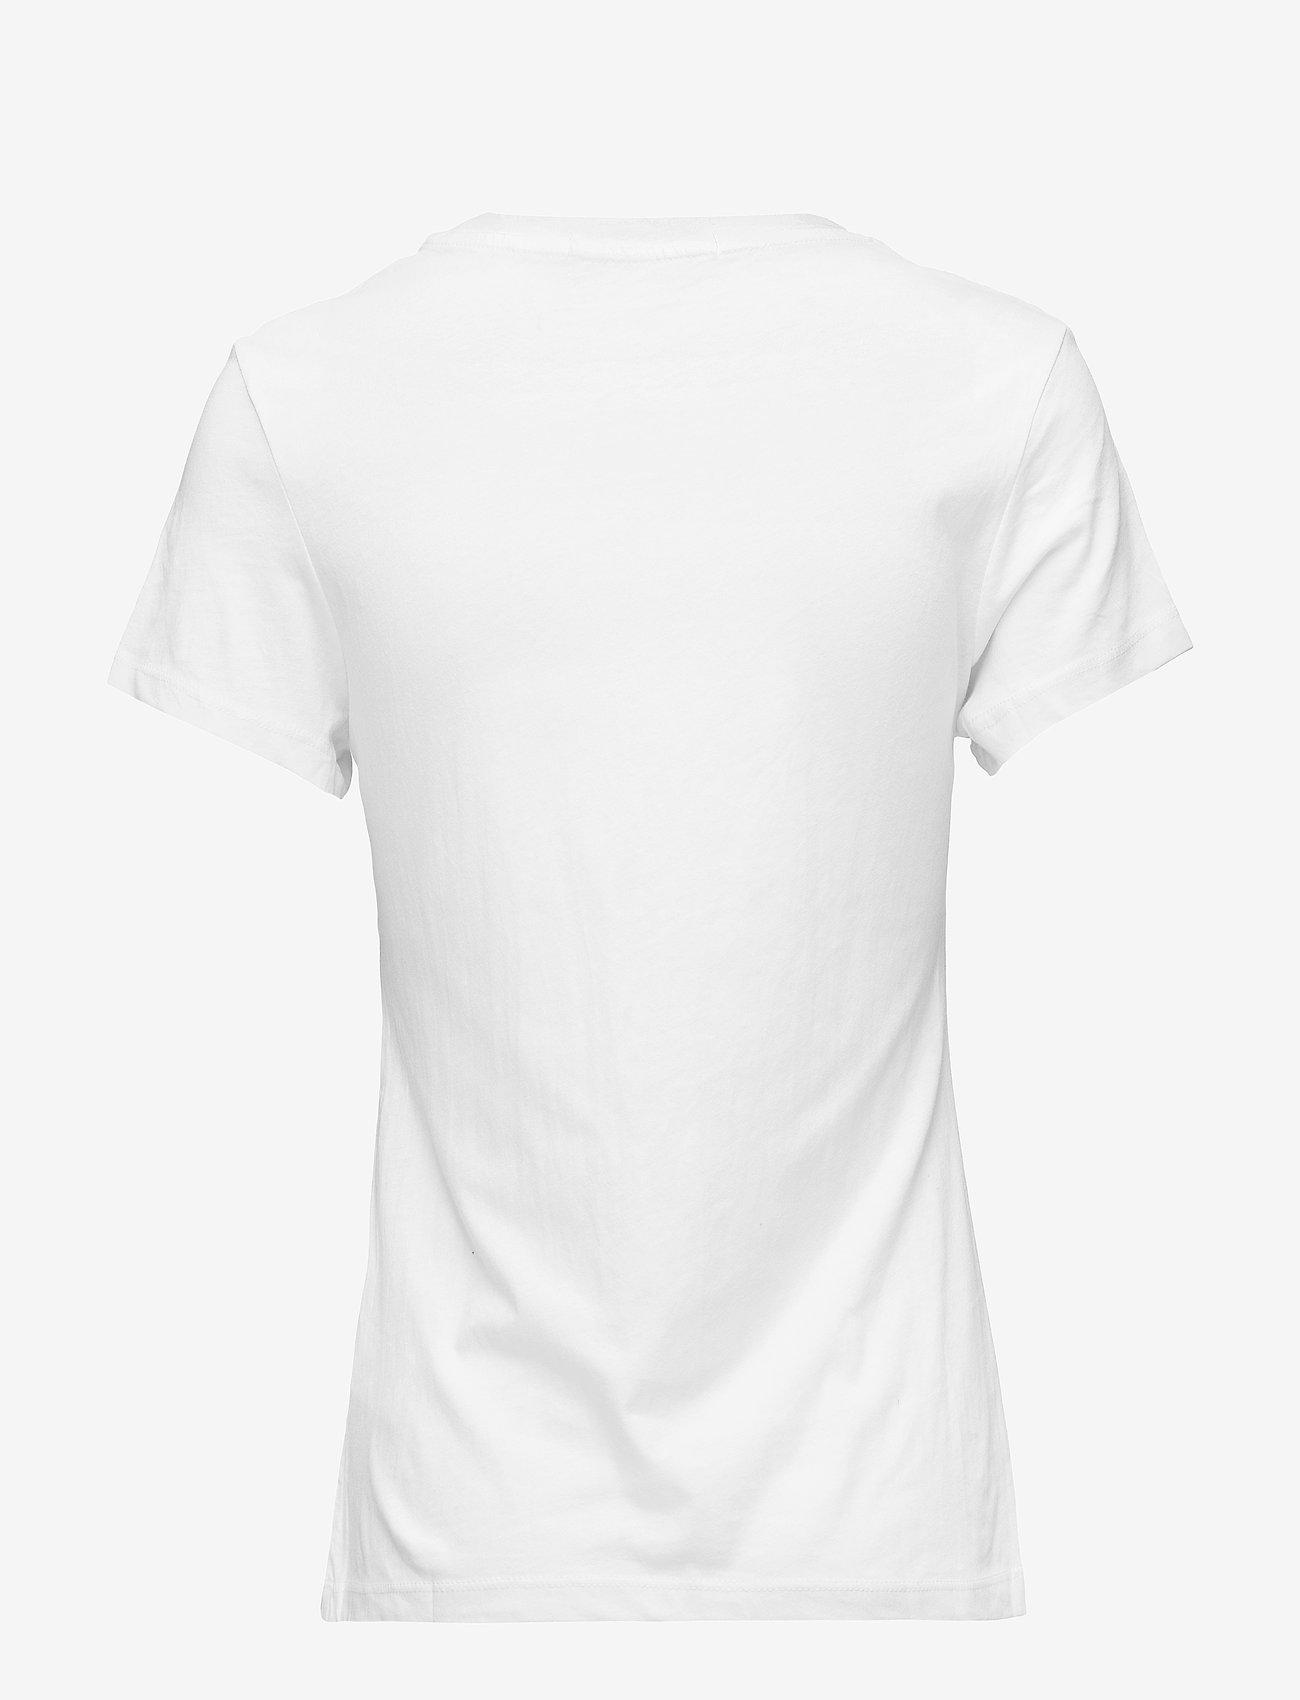 Calvin Klein Jeans - CORE INSTIT LOGO SLIM FIT TEE - t-shirts - bright white - 1